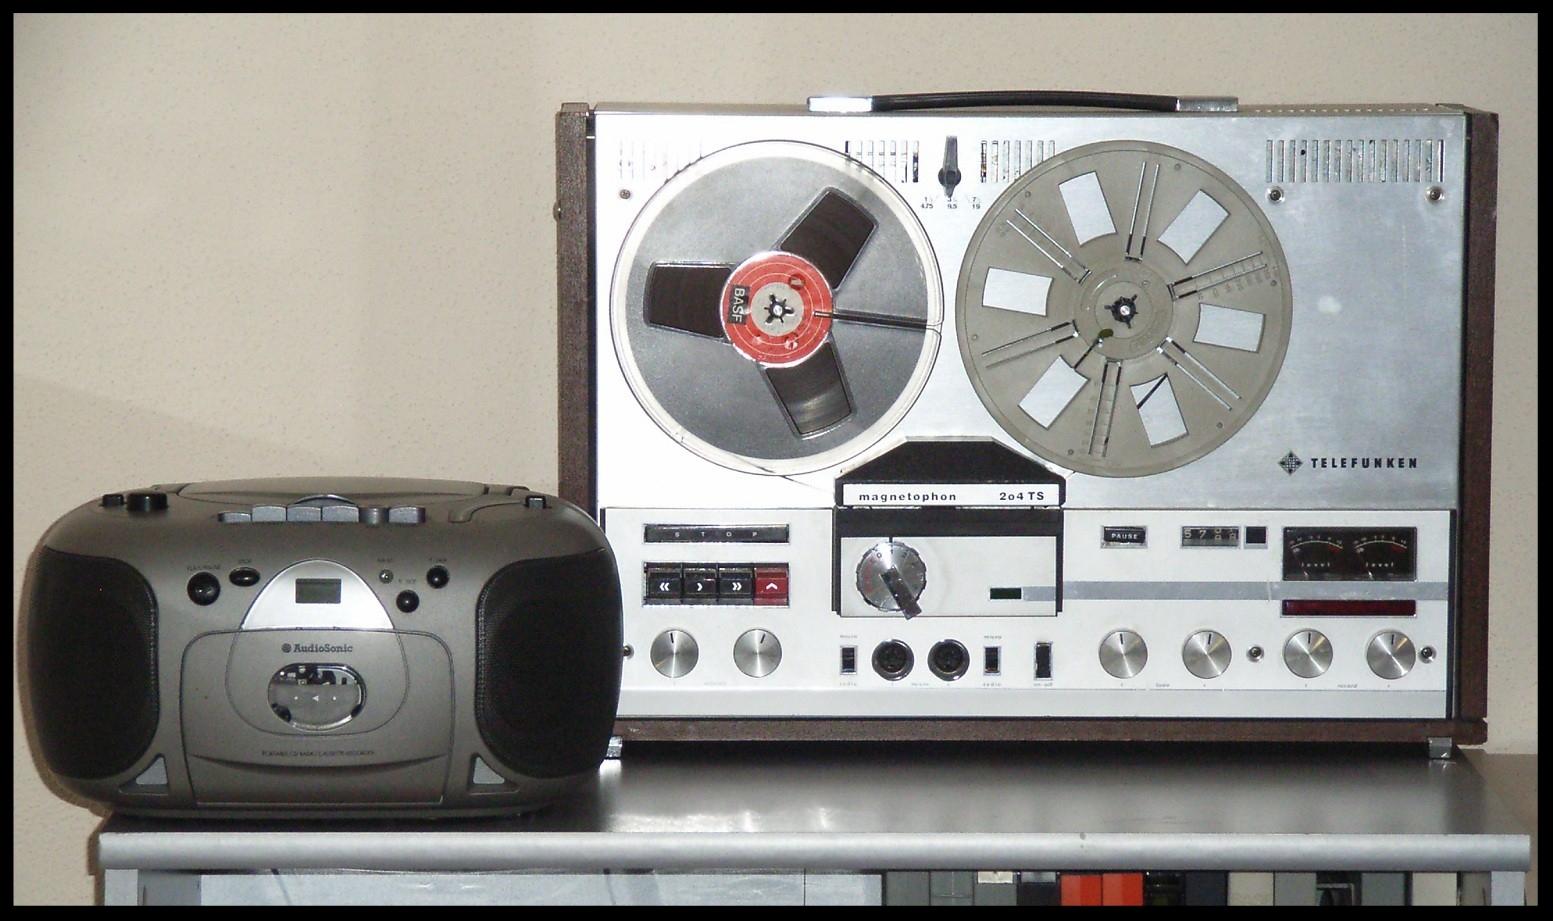 CD,-Kassettenspieler und Tonbandgerät